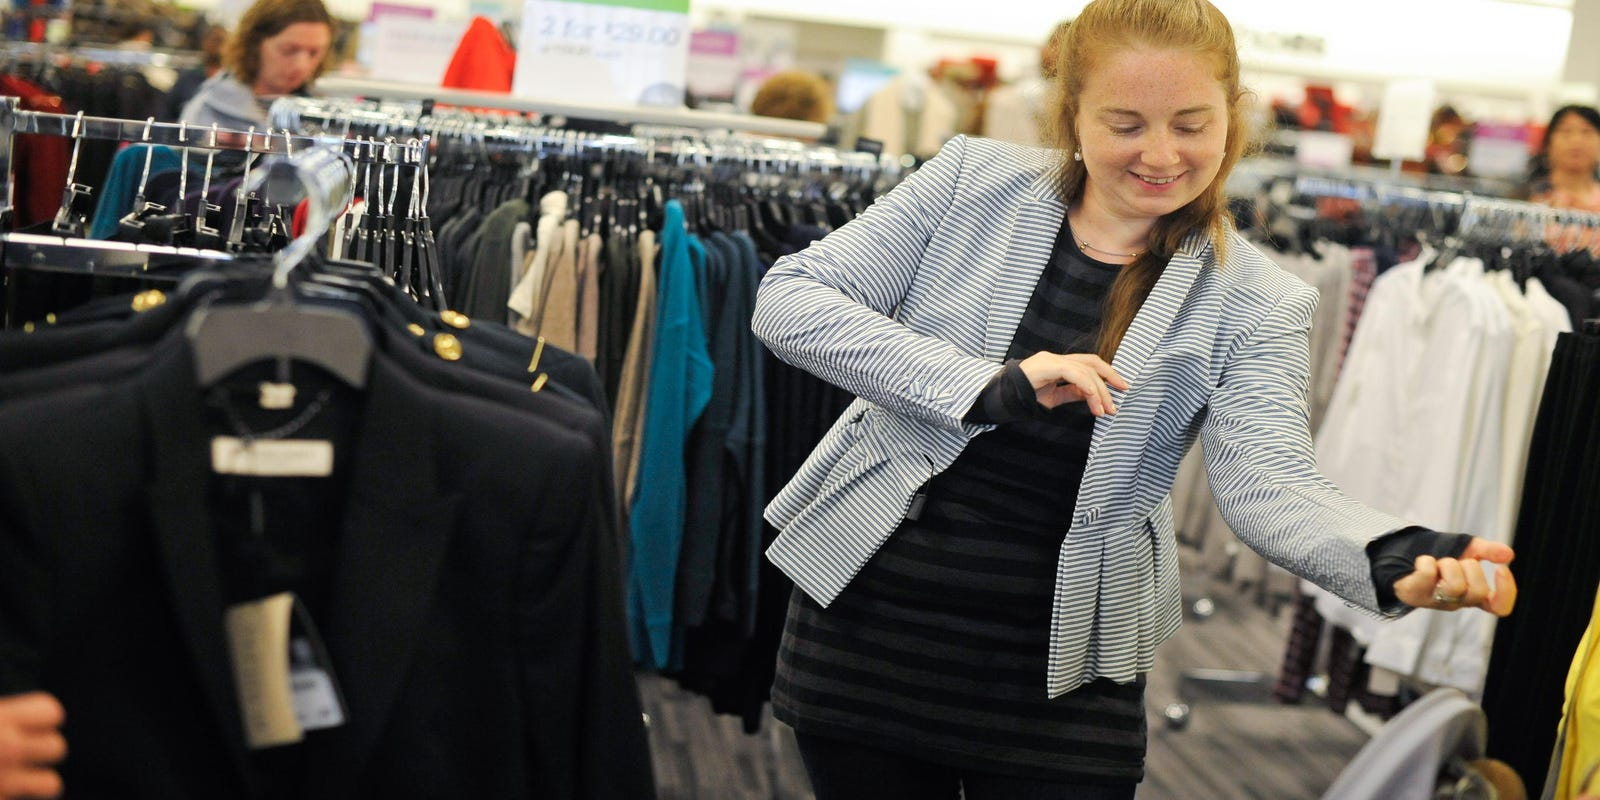 e23a1eaf828 Shop Christiana s new Nordstrom Rack like an insider